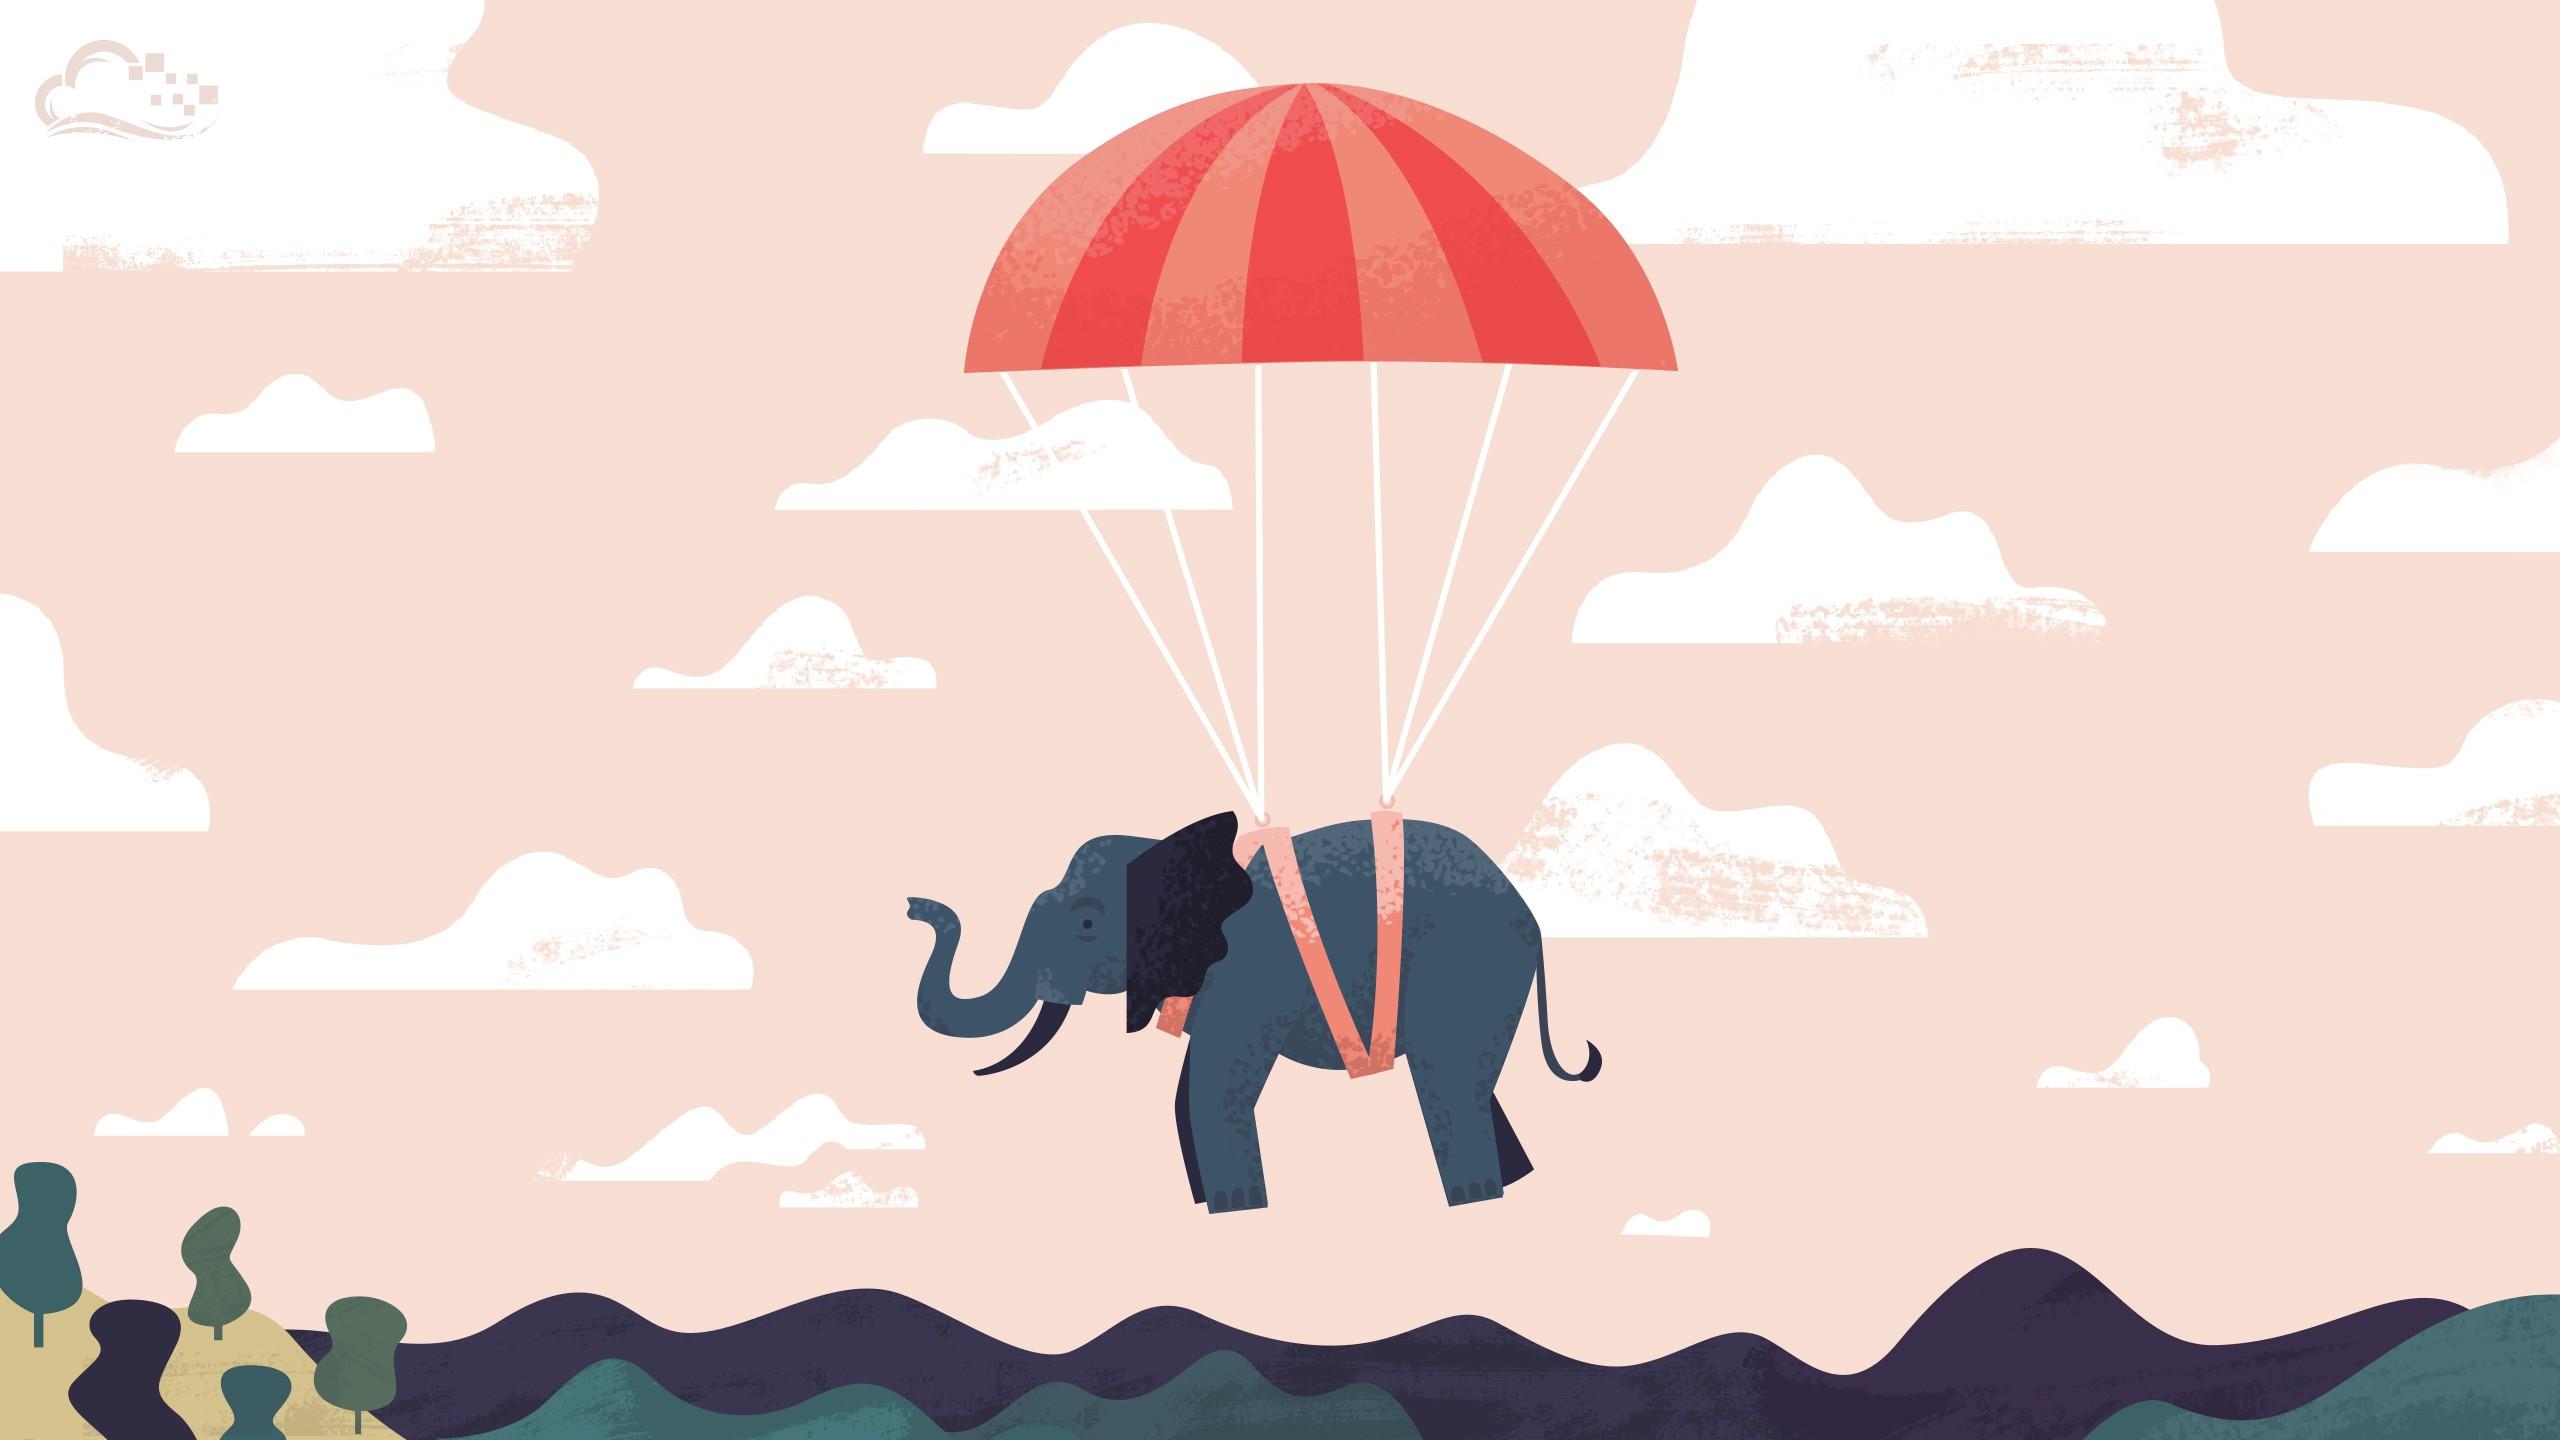 Best Wallpaper Cartoon Elephant - illustration-minimalism-cartoon-elephant-brand-digitalocean-ART-font-117494  Best Photo Reference_806856  .jpg